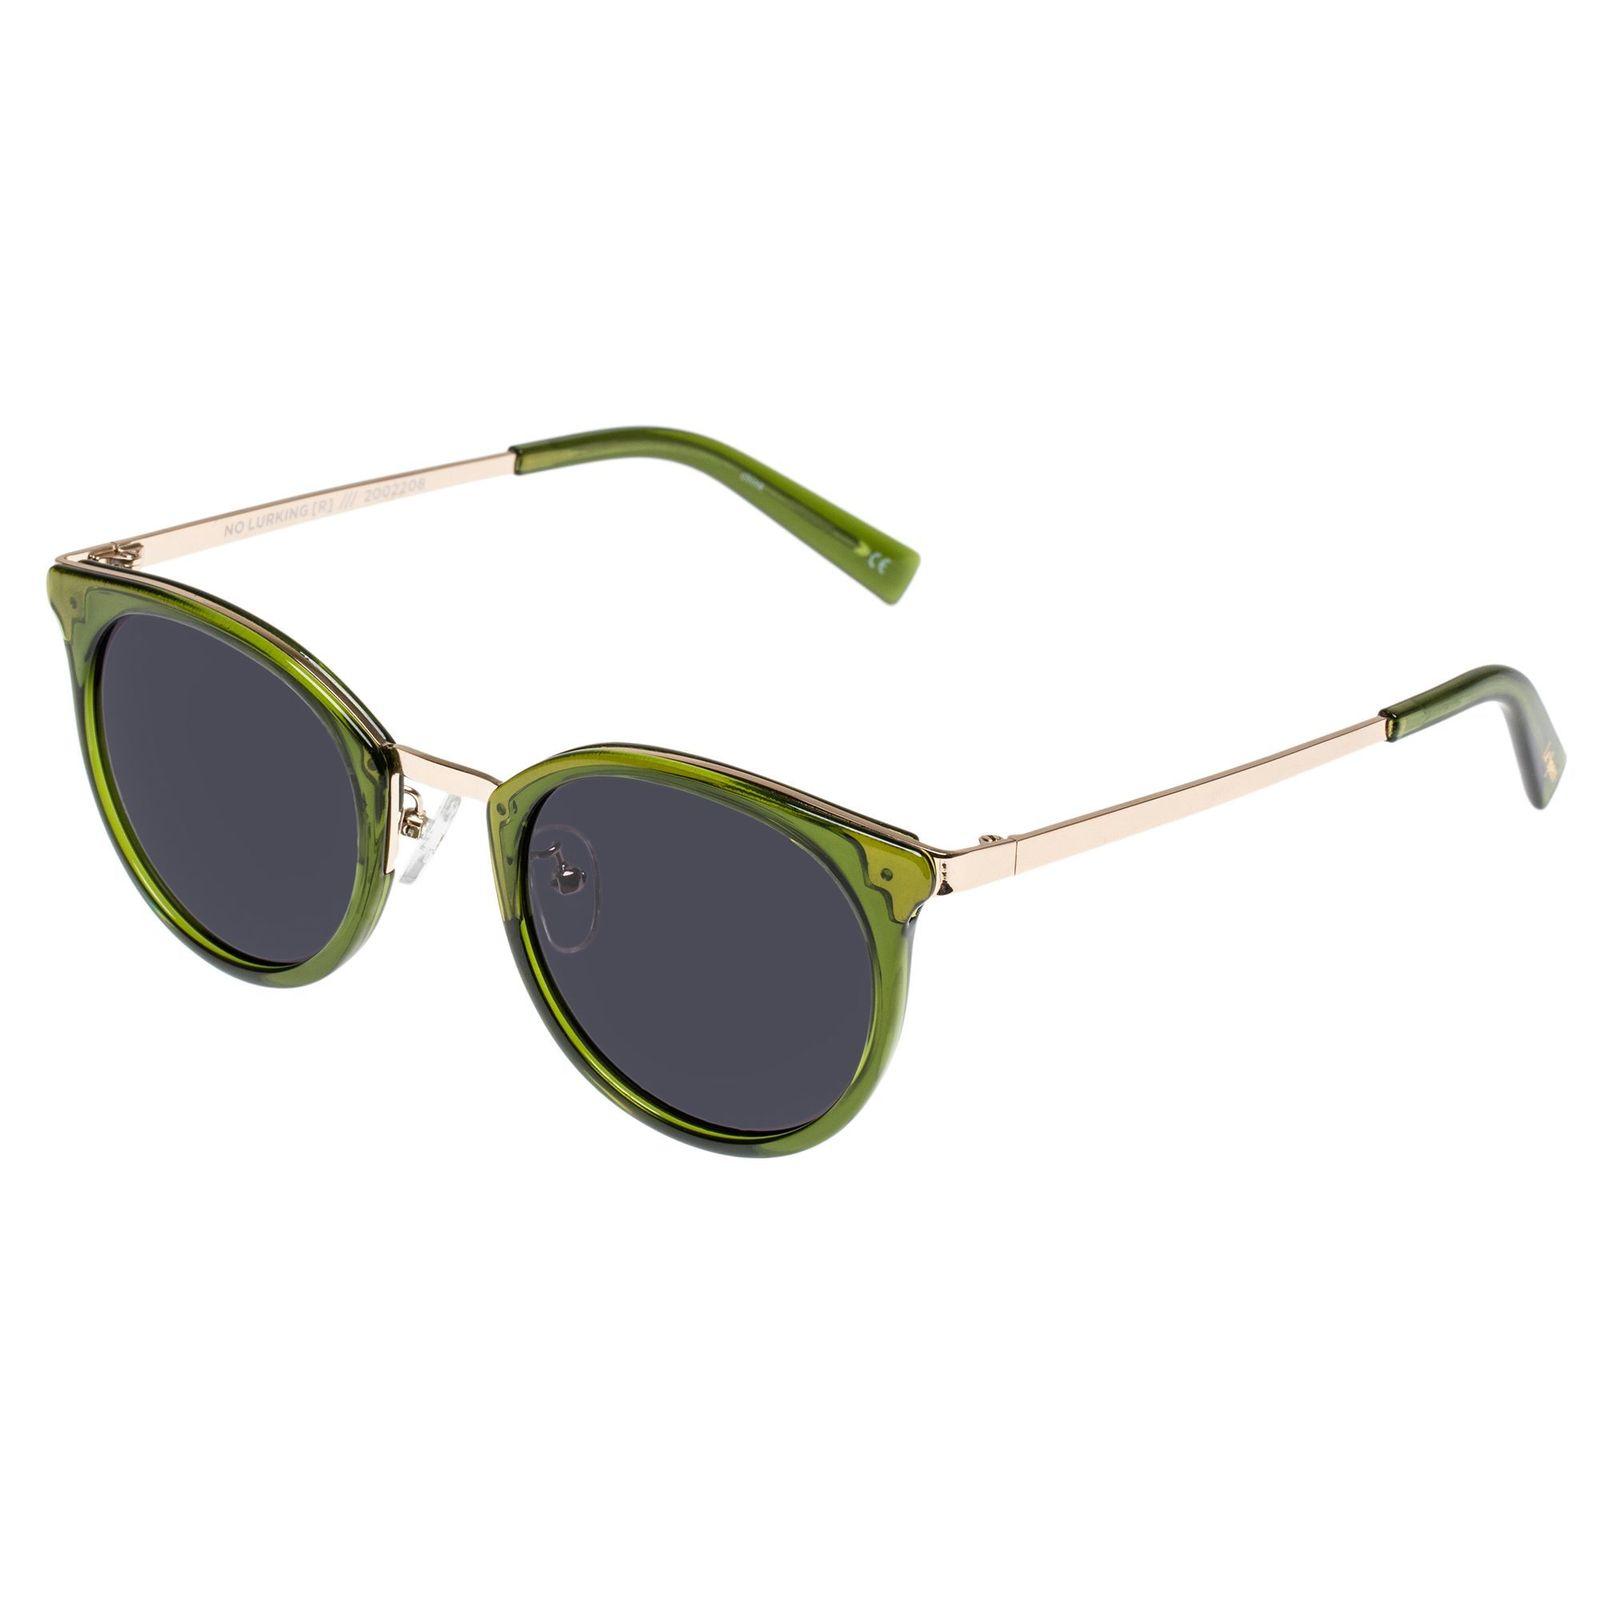 Le Specs- No Lurking- Khaki